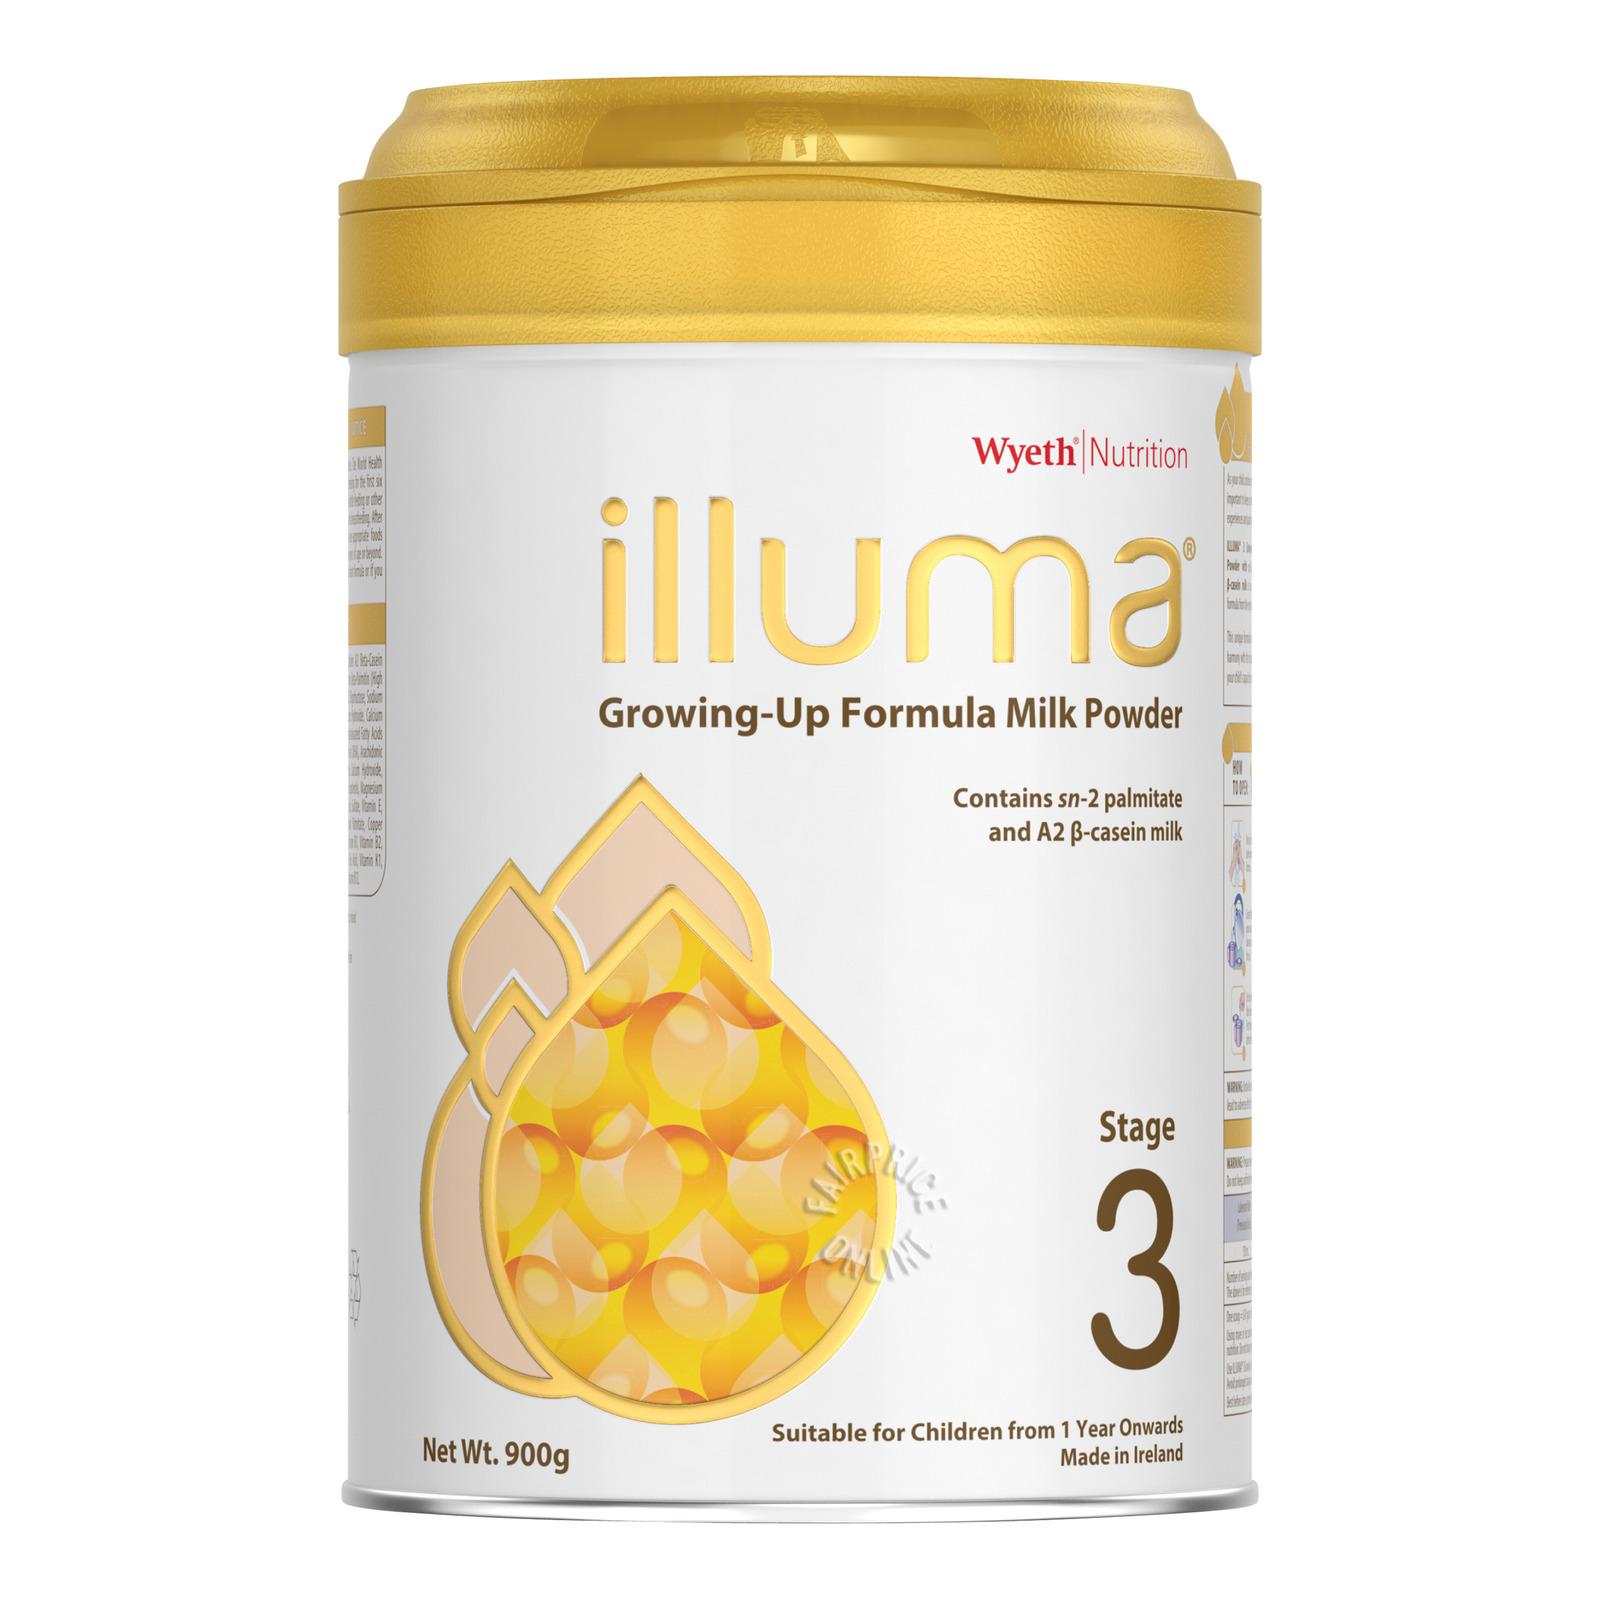 Illuma Growing-Up Formula Milk Powder - Stage 3